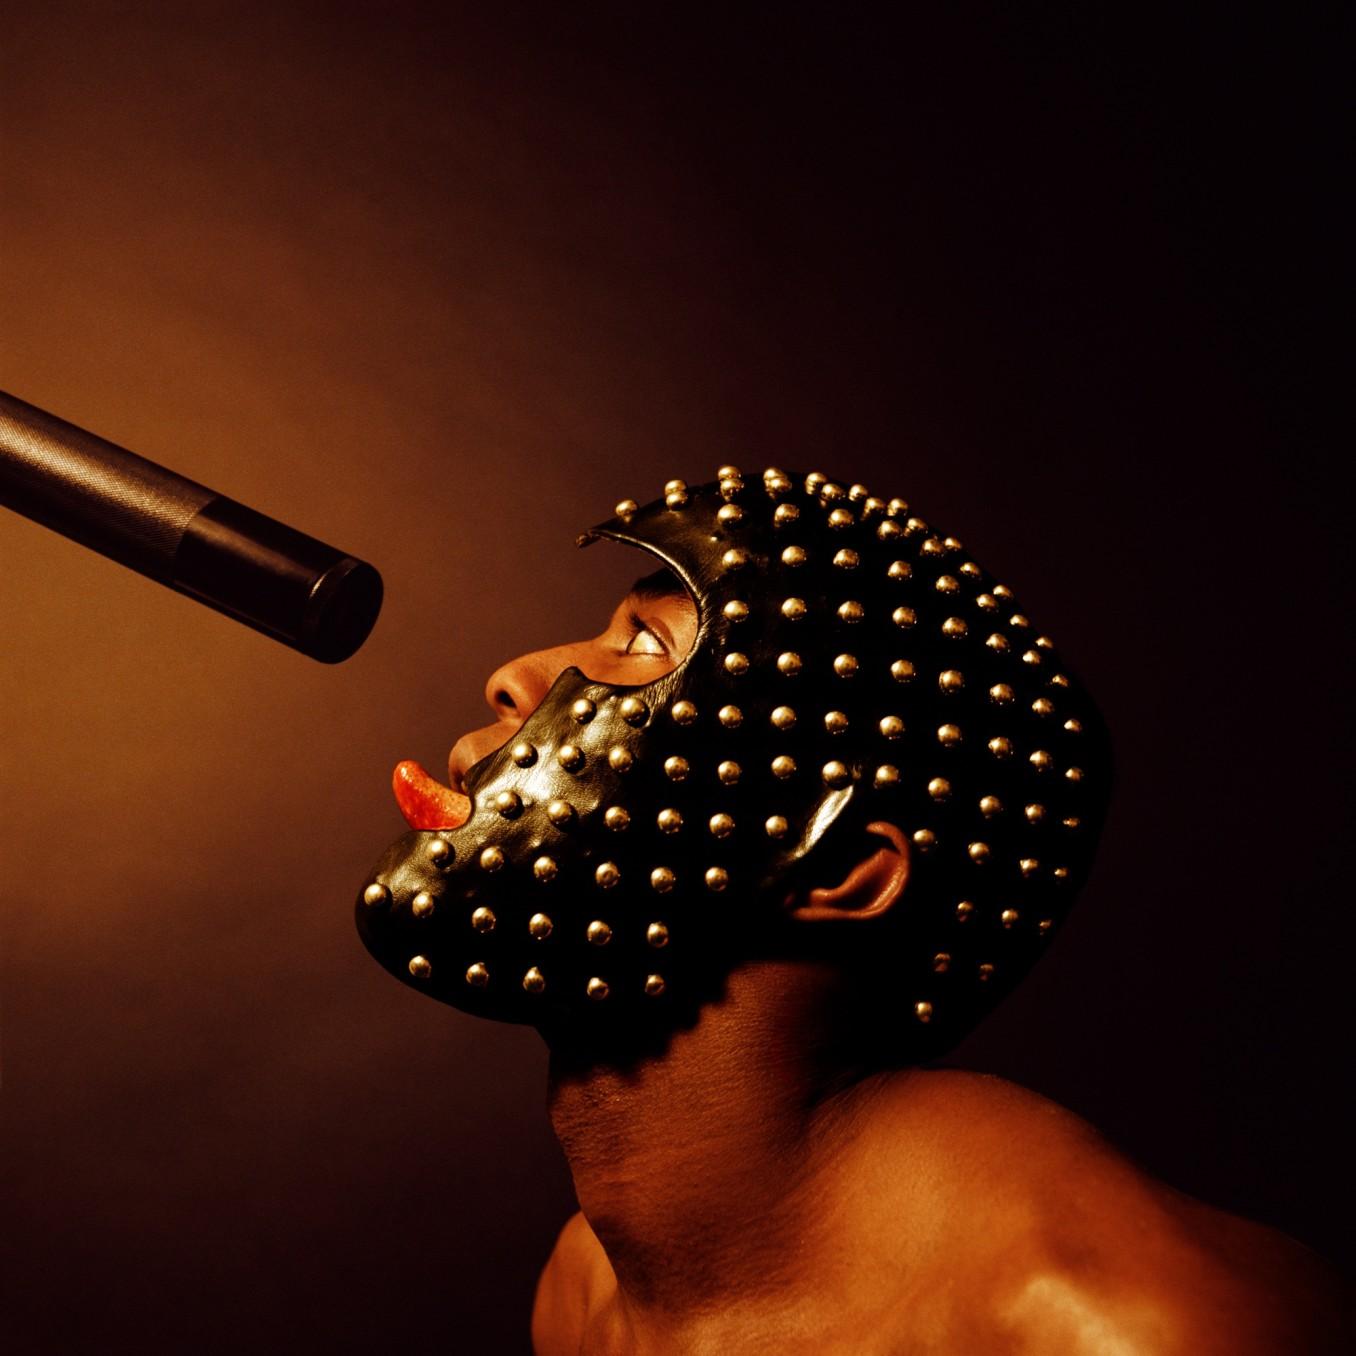 Rotimi Fani Kayode, Untitled Bodies Of Experience, 1989